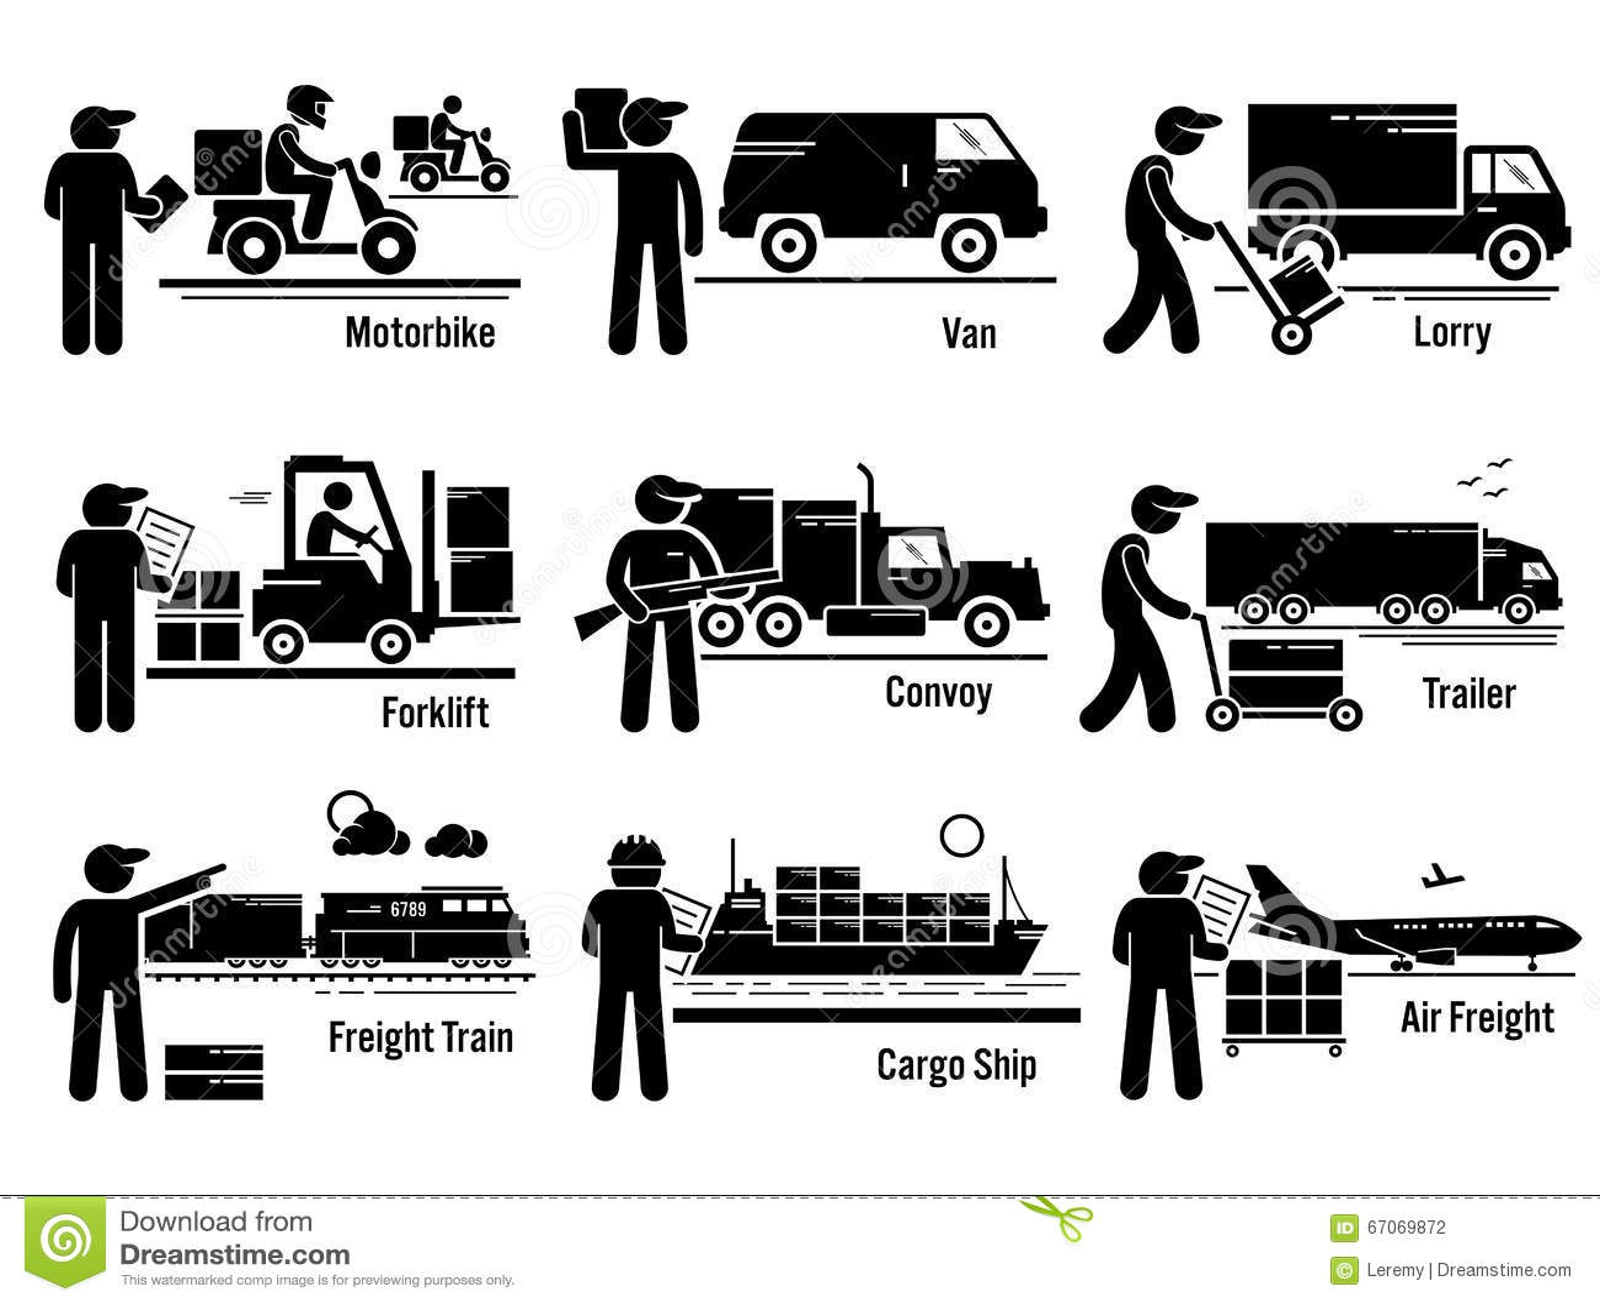 Logistic Transportation Vehicles Set Clipart Stock Vector